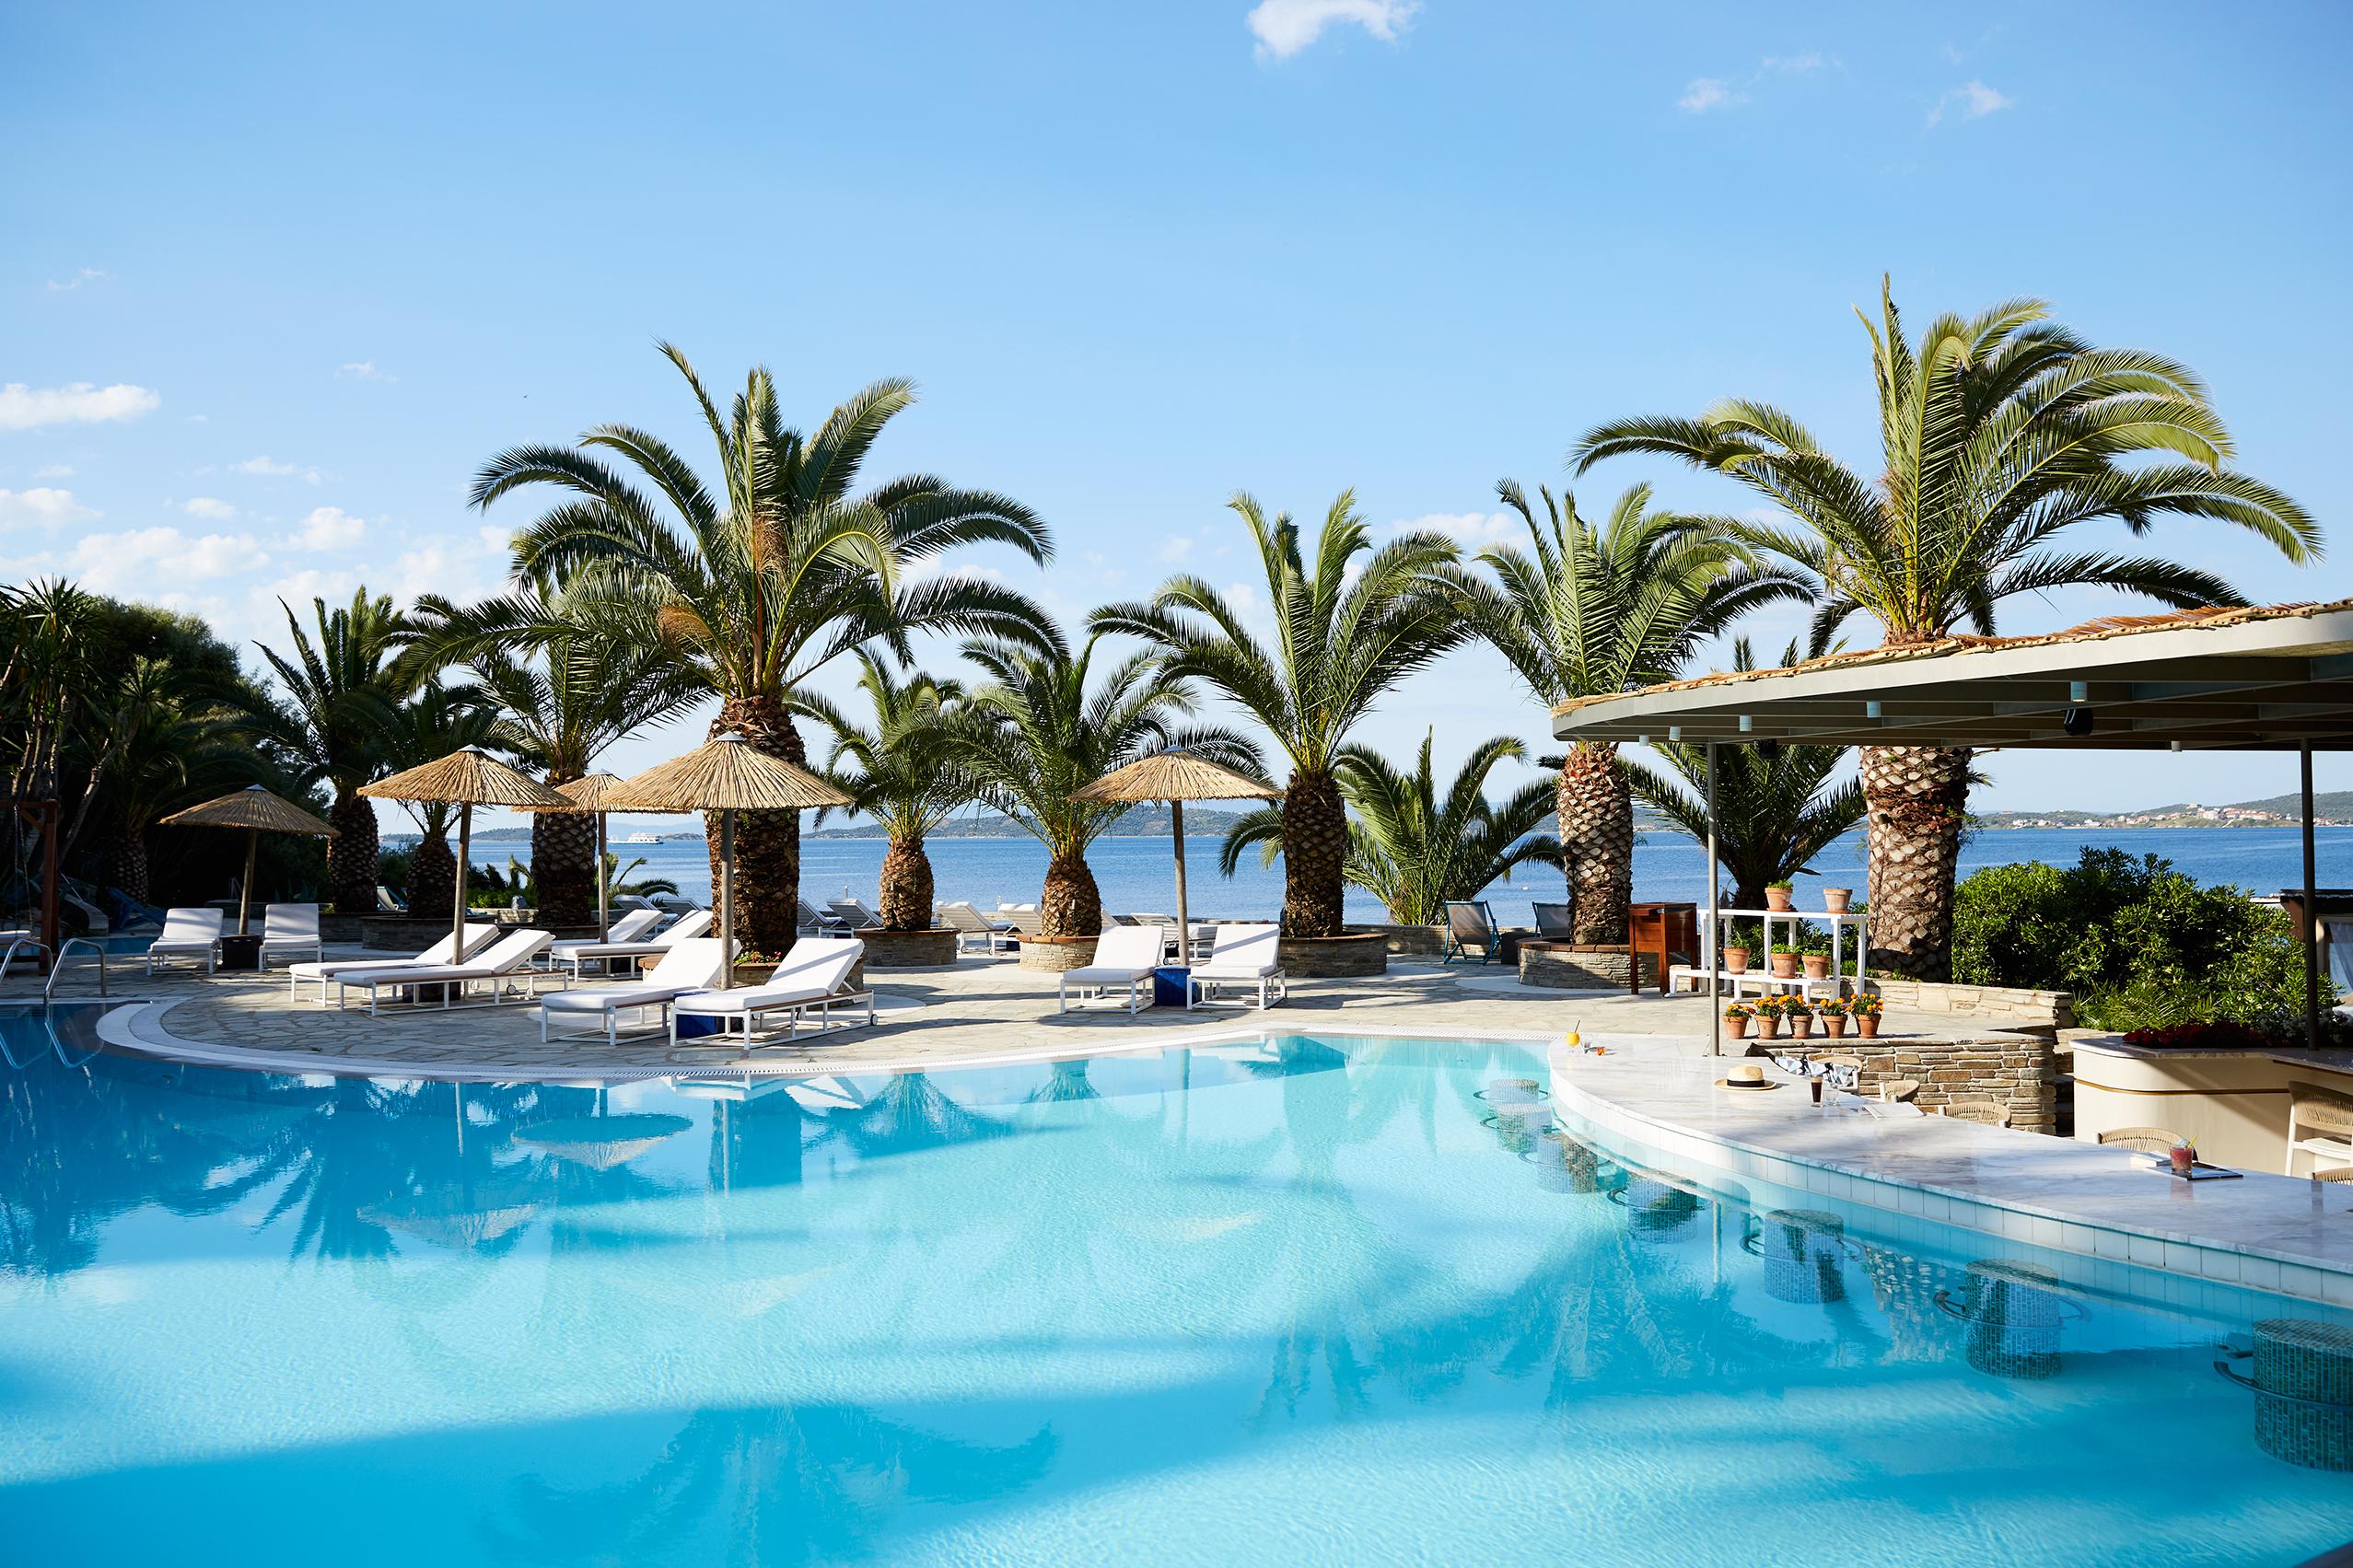 eagles-palace-hotel-halkidiki-greece